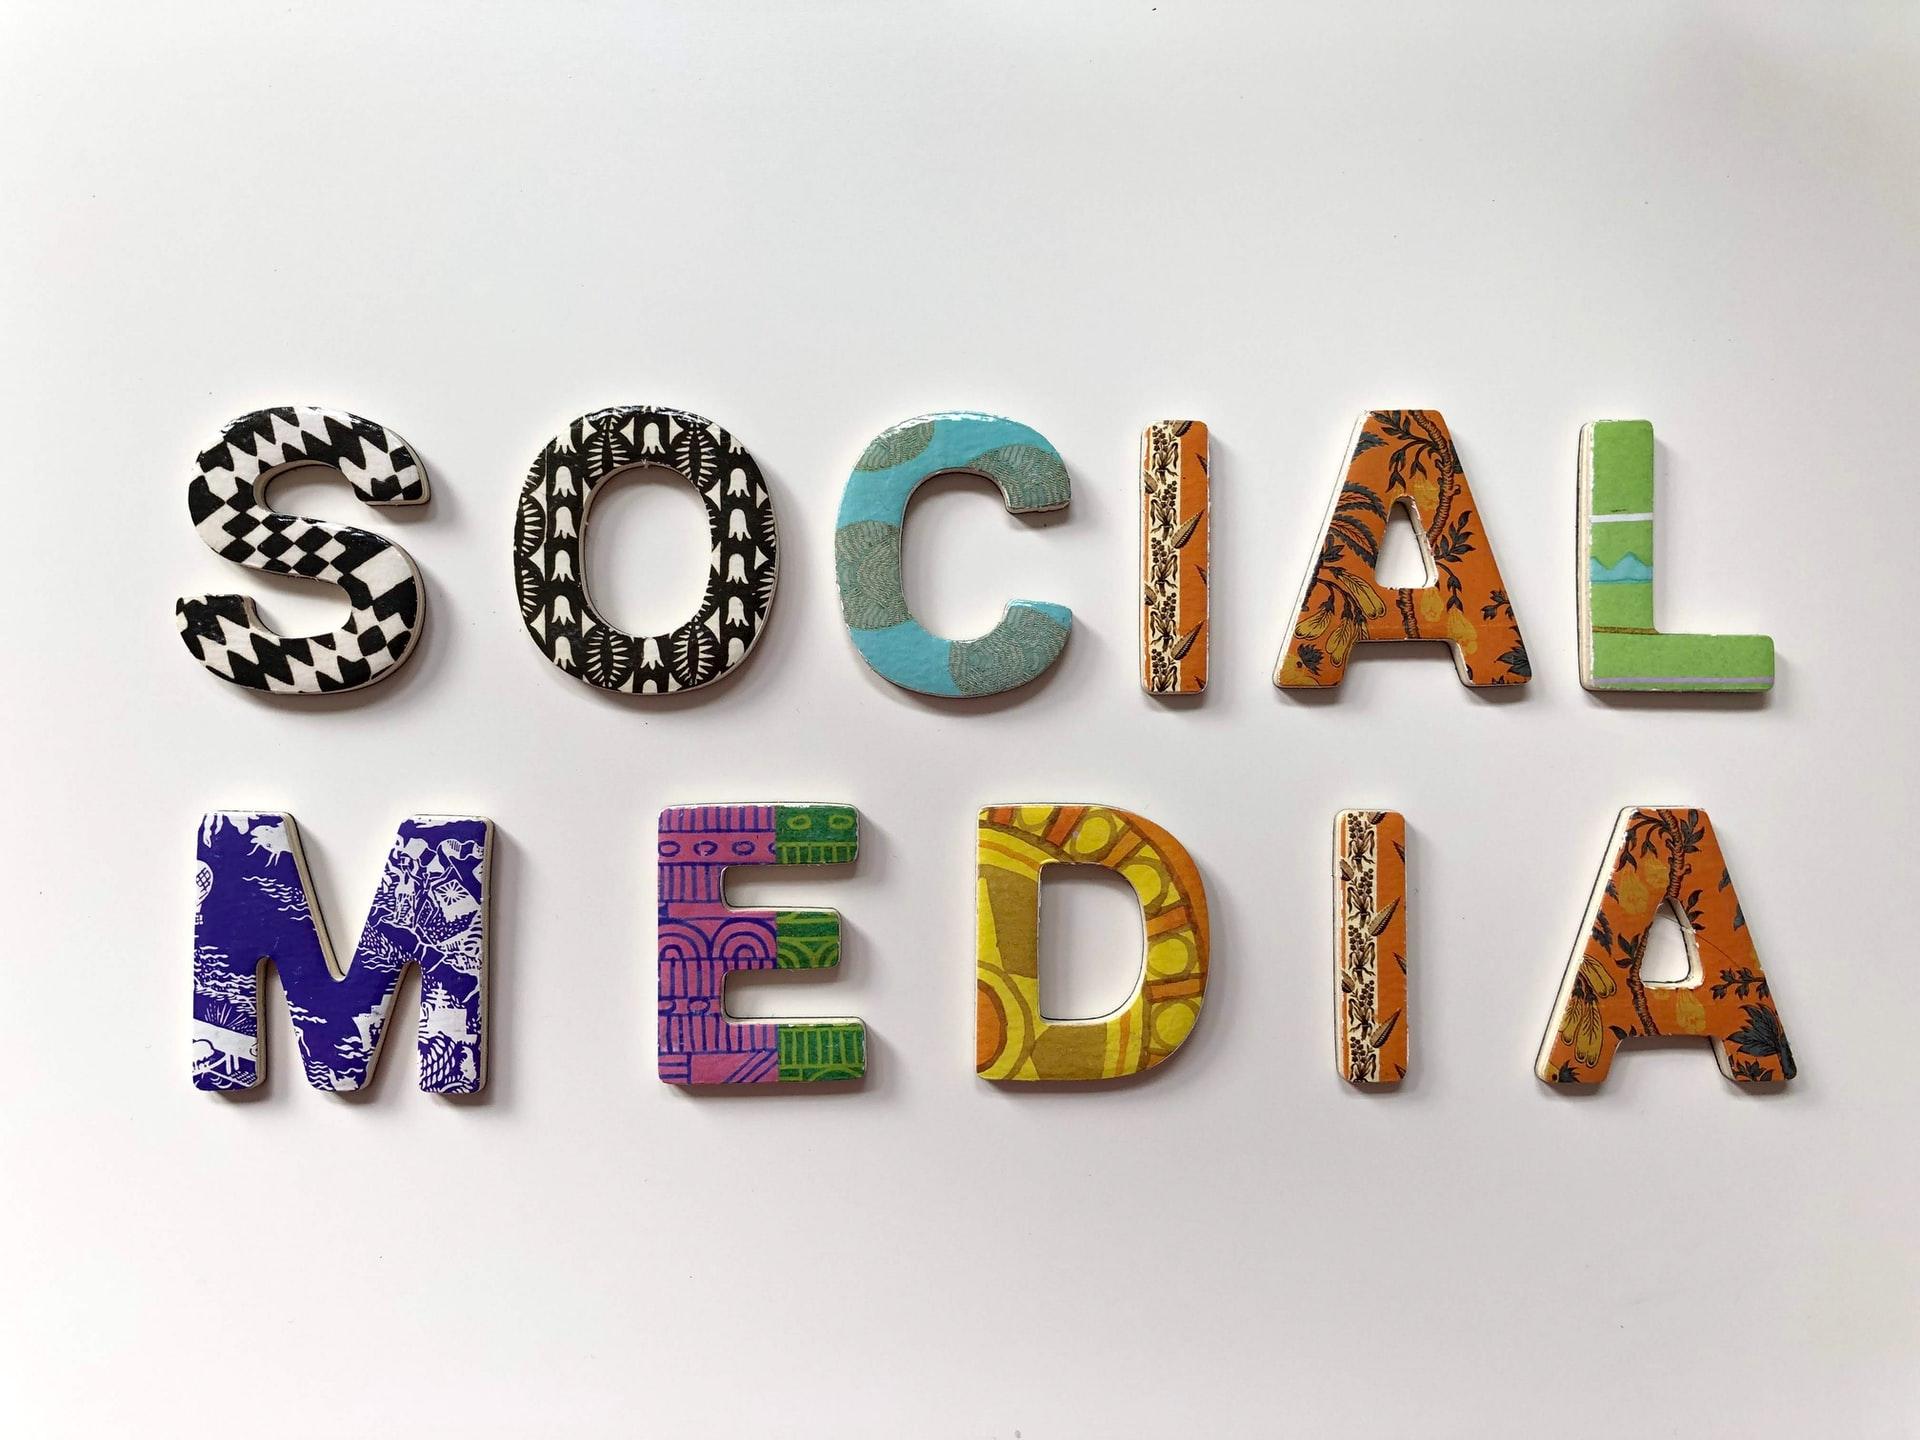 maropost-social media generation